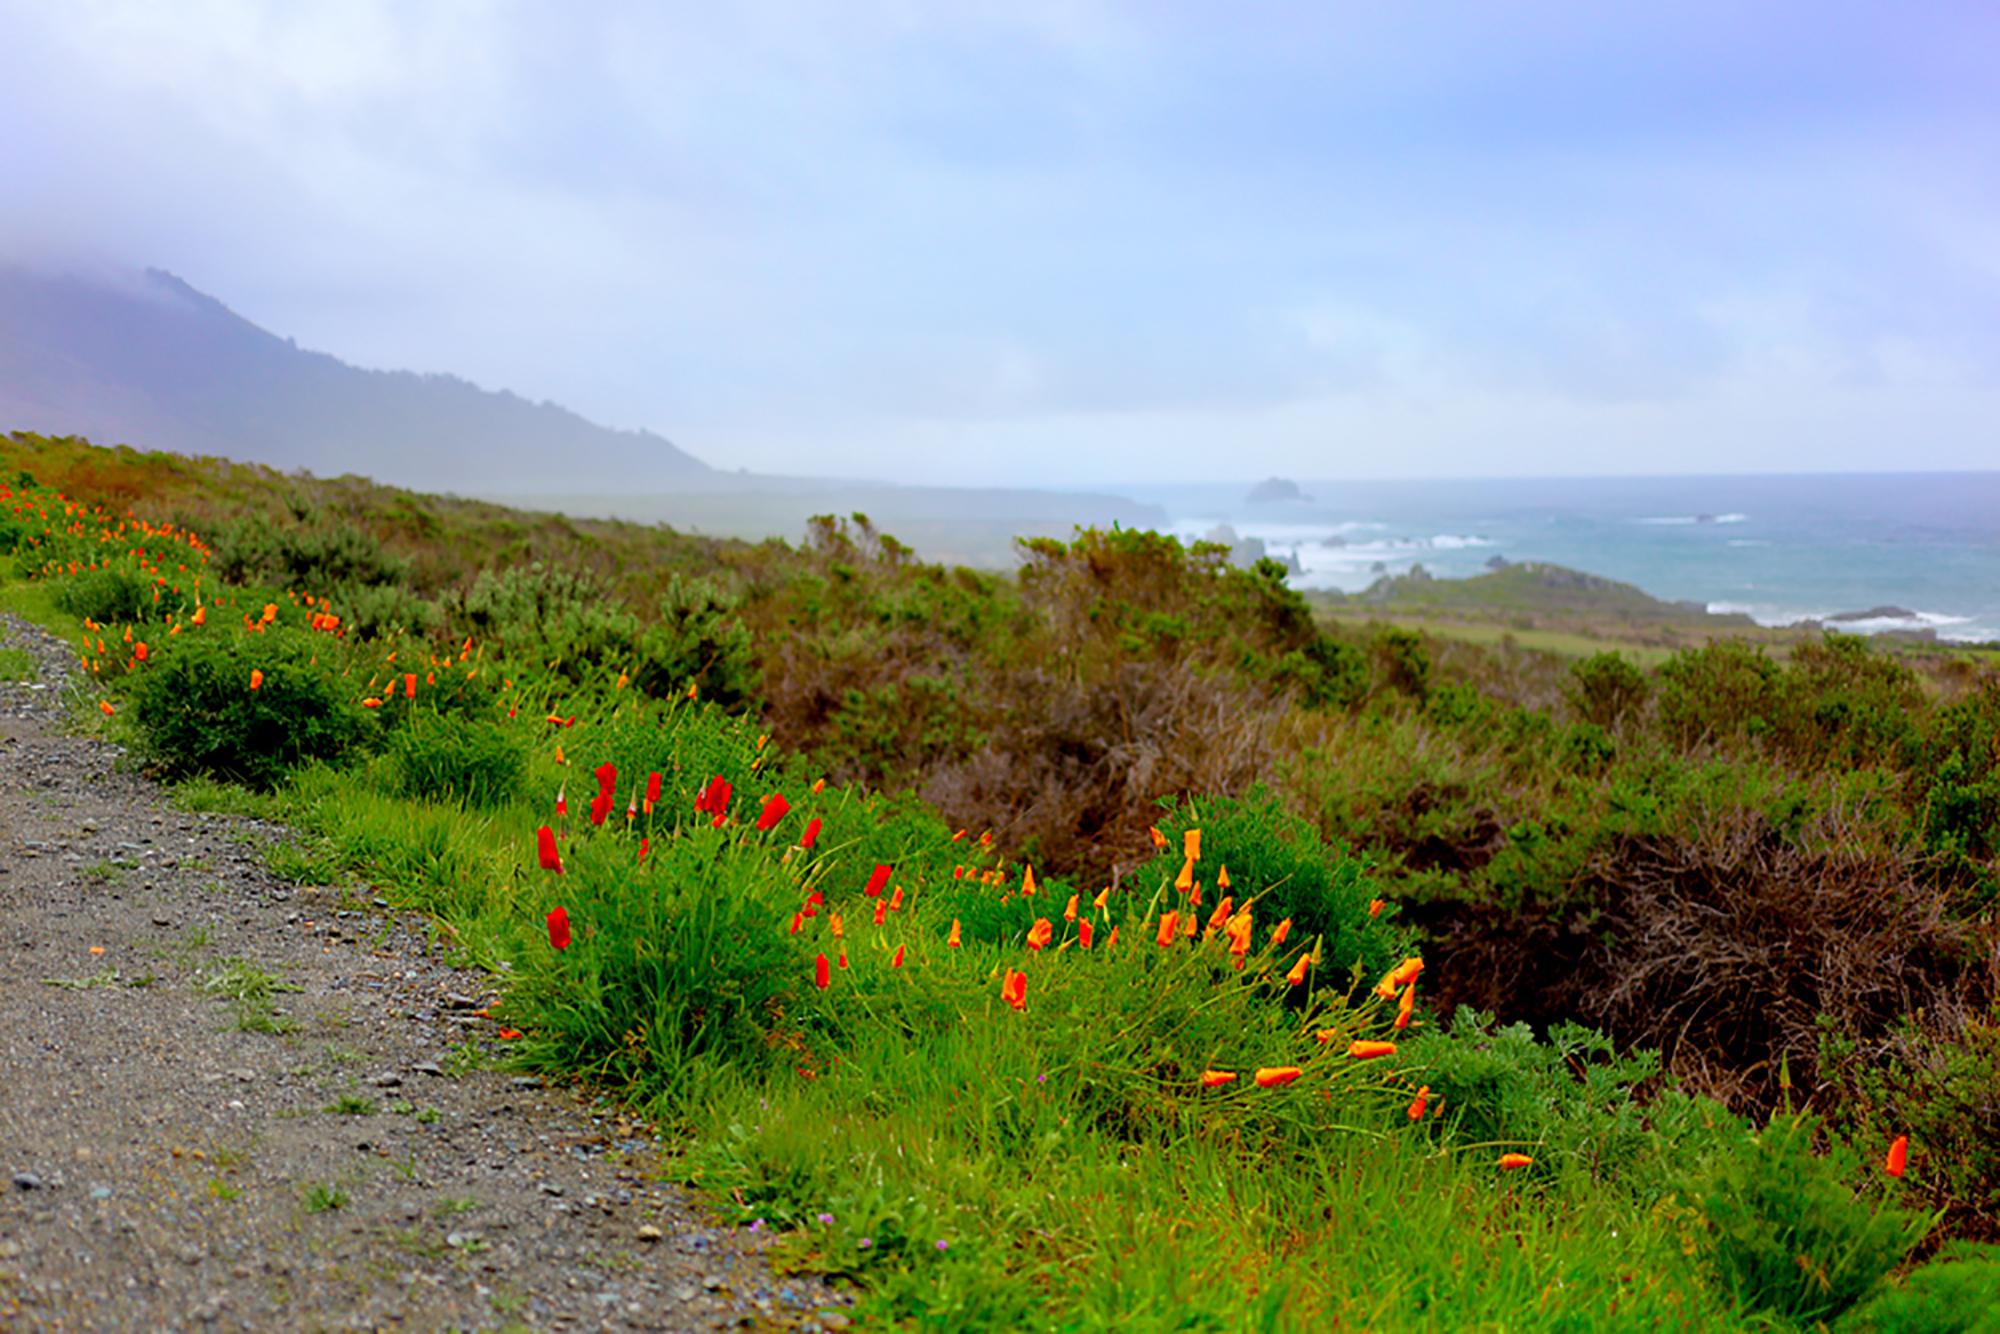 Coastal Poppies by Rich J. Velasco